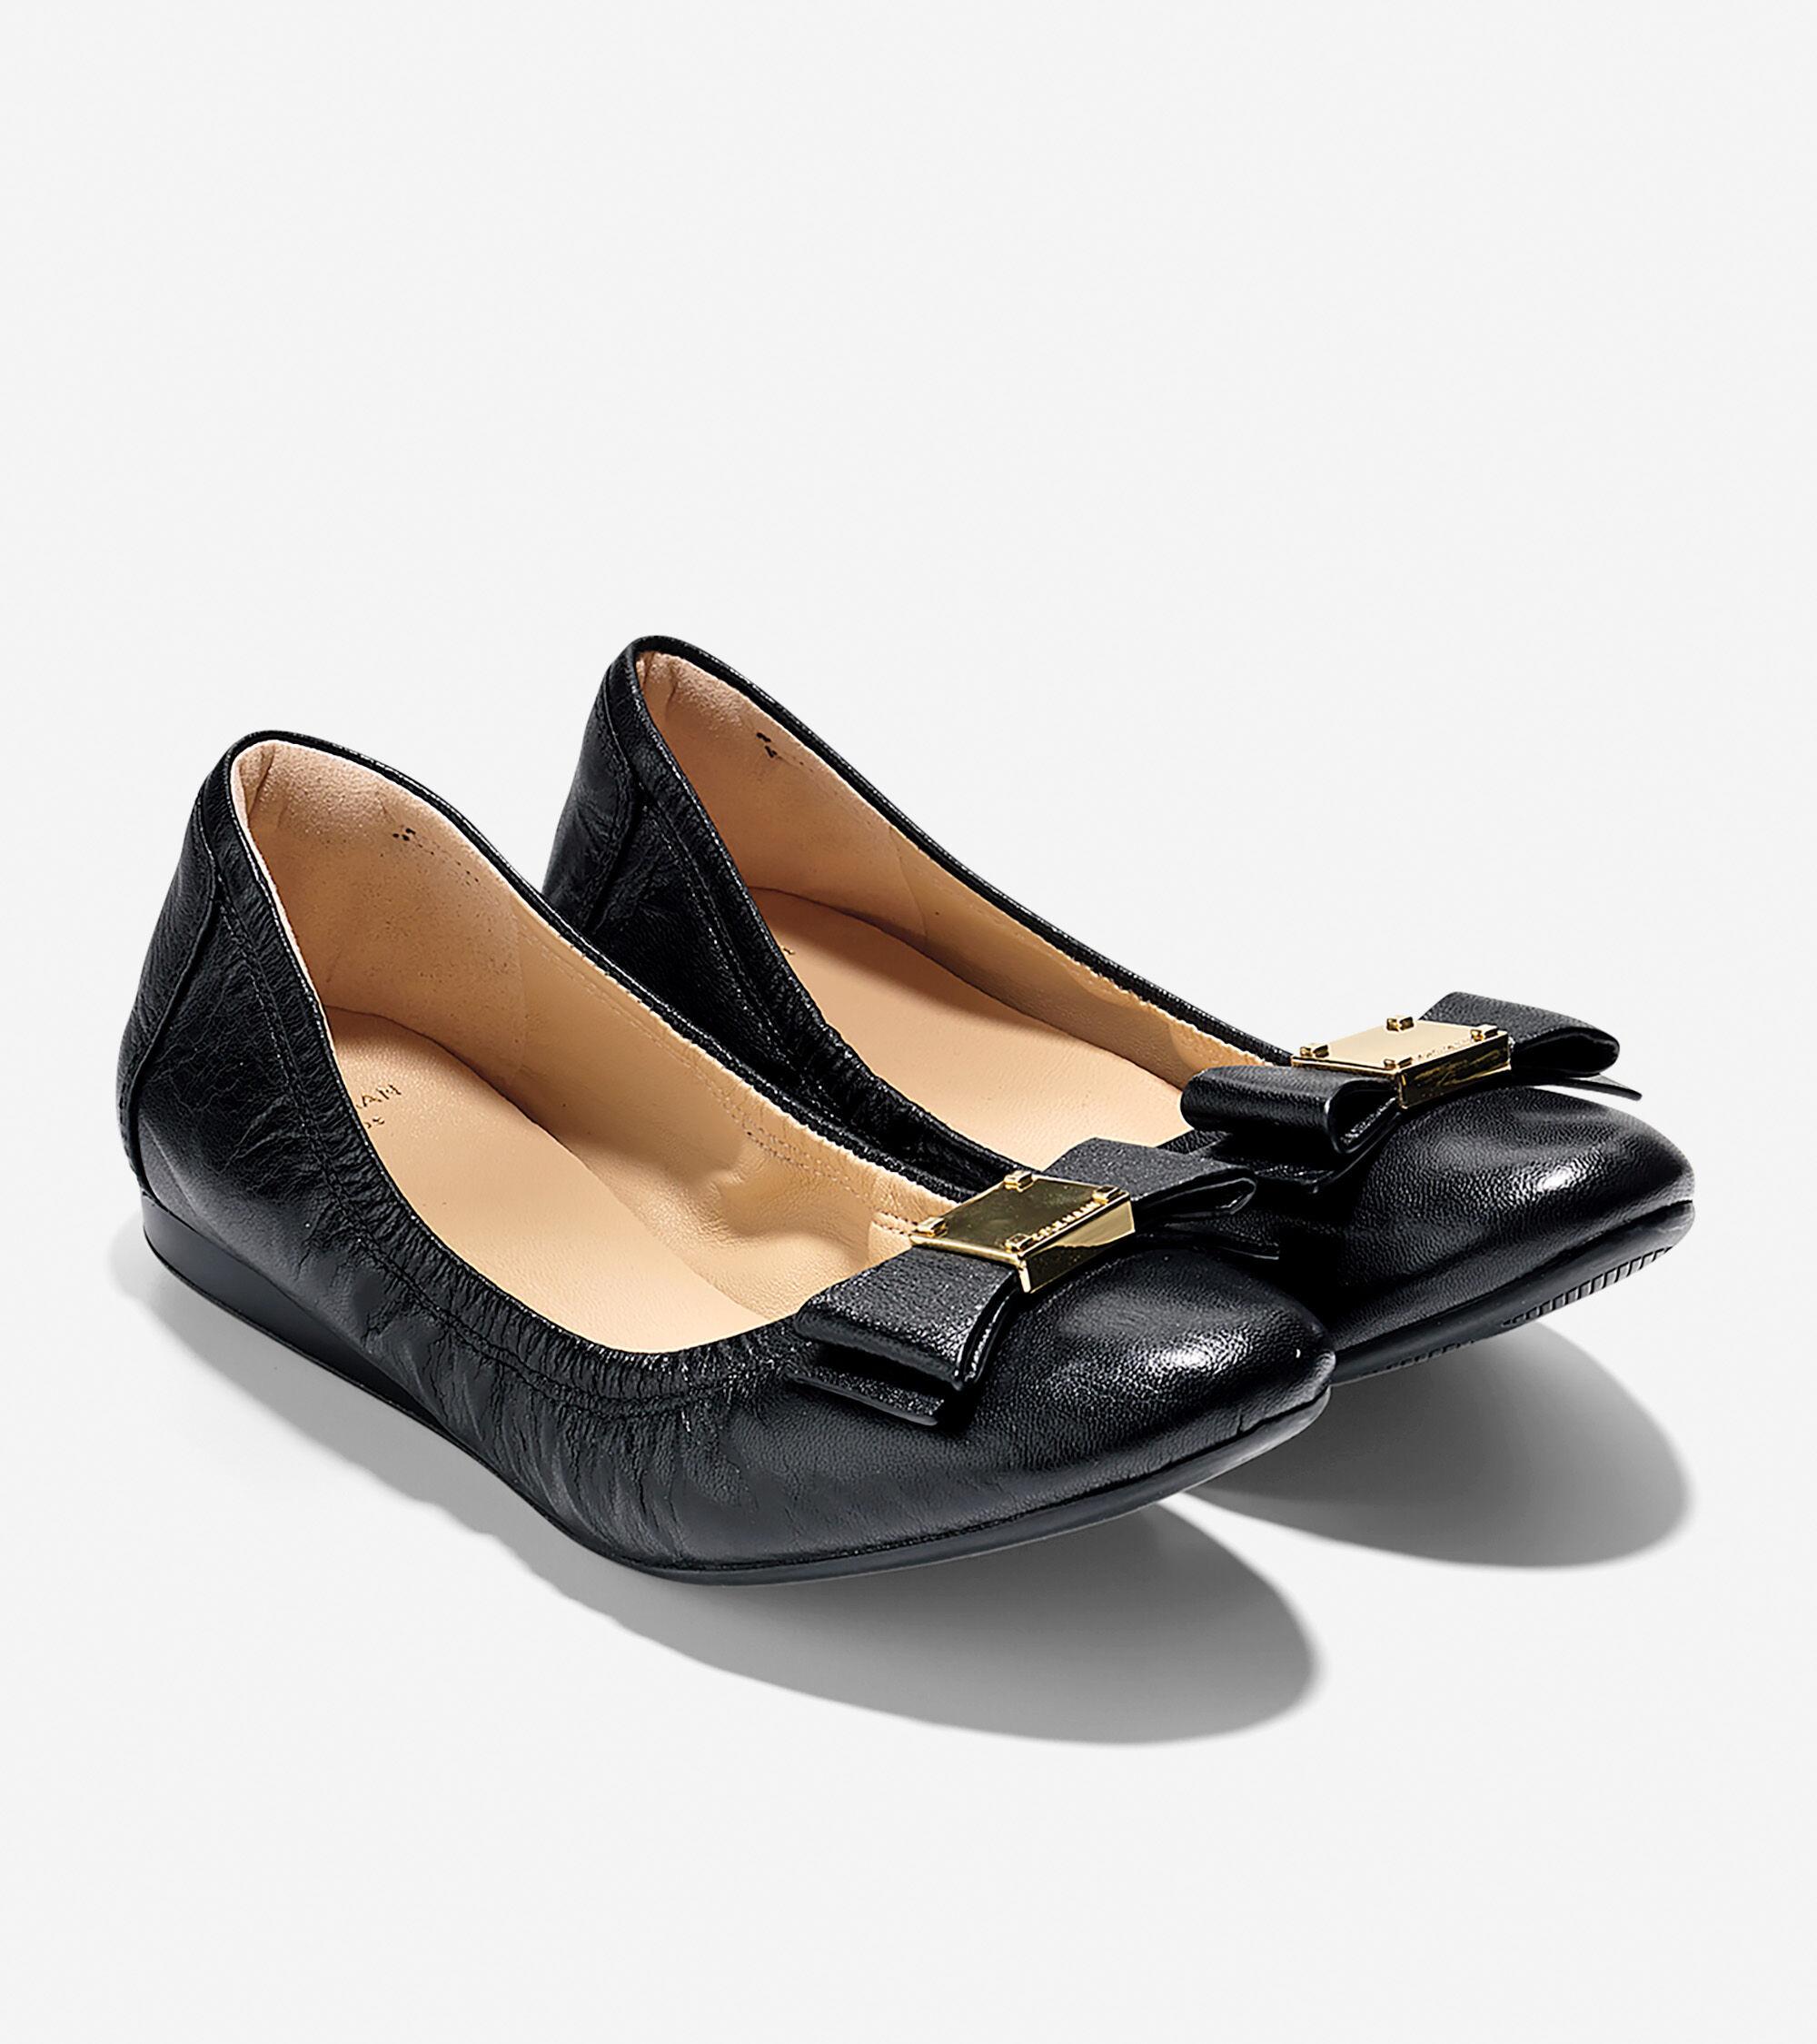 87a42a0d0e3f Women s Tali Bow Ballet Flats in Black